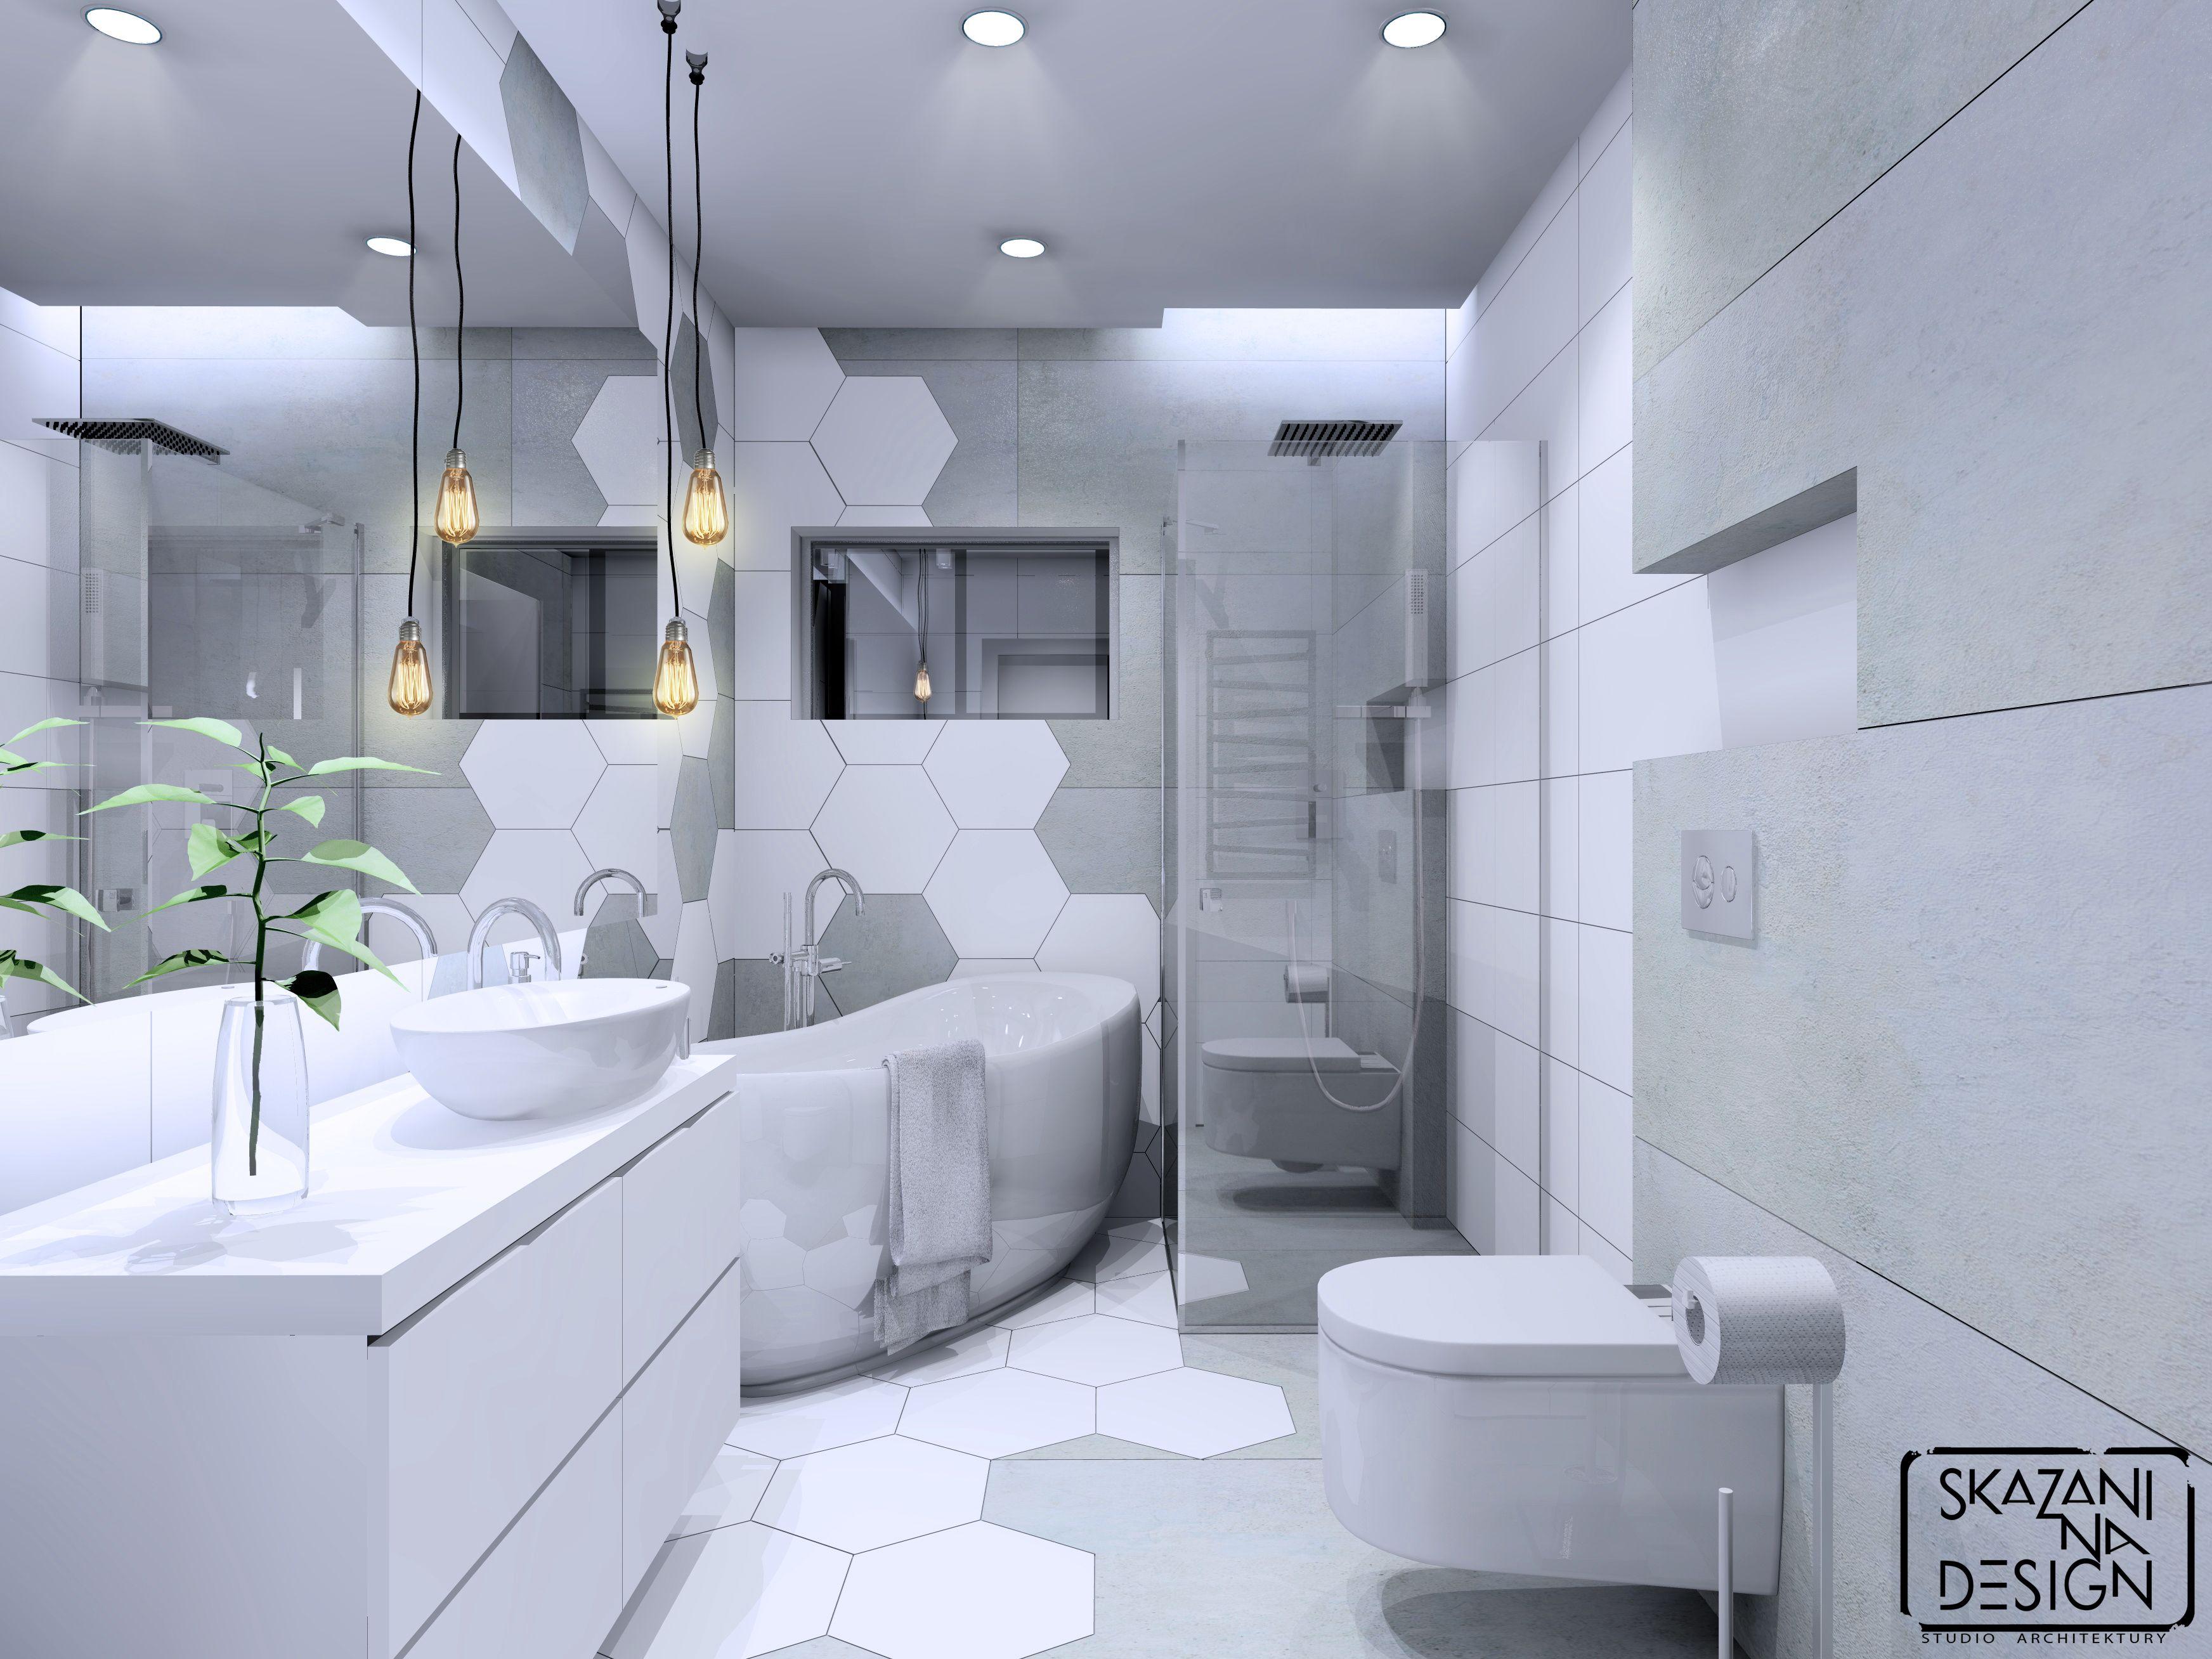 Pin Na łazienki Projekty Skazani Na Design